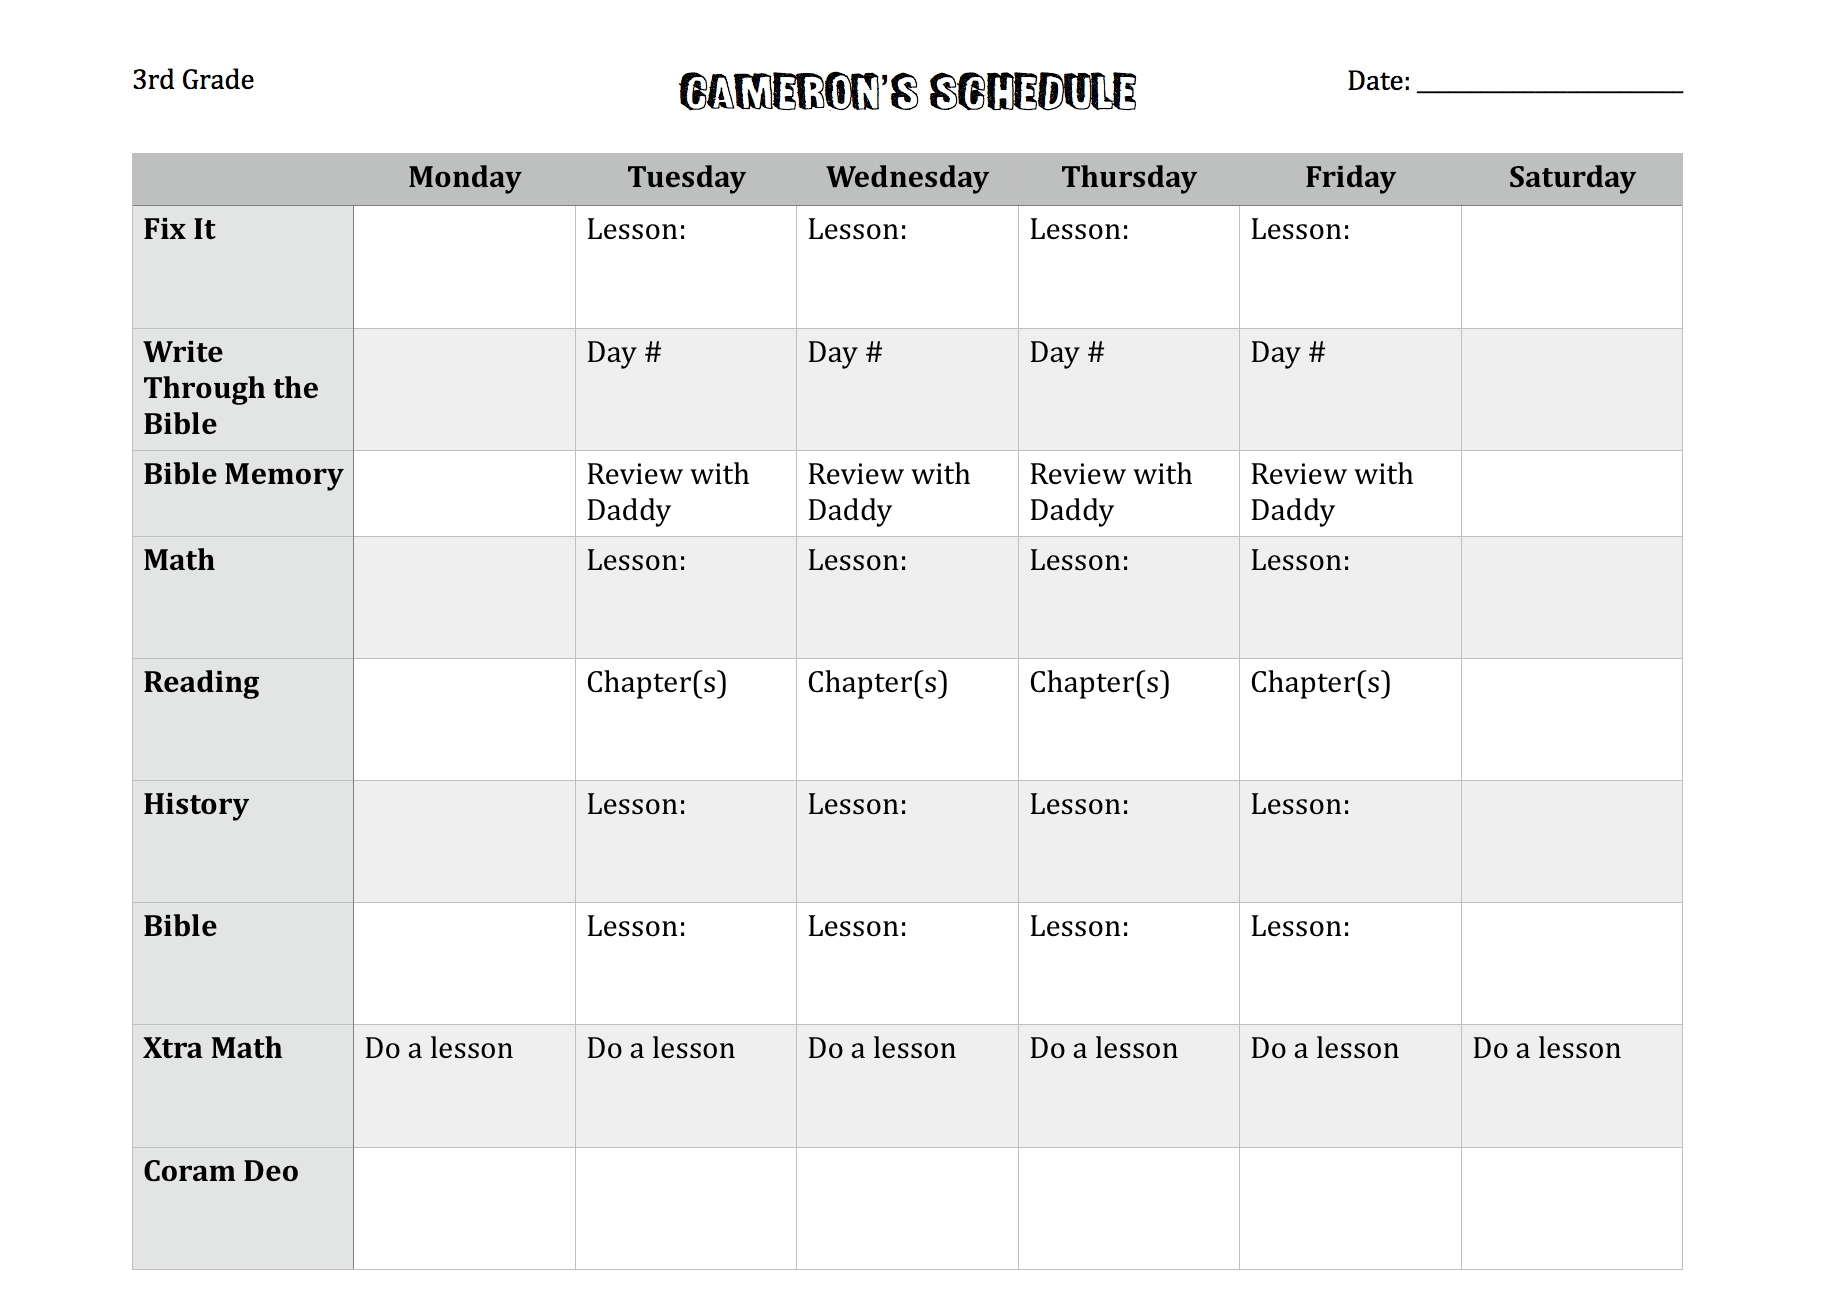 Cameron Schedule